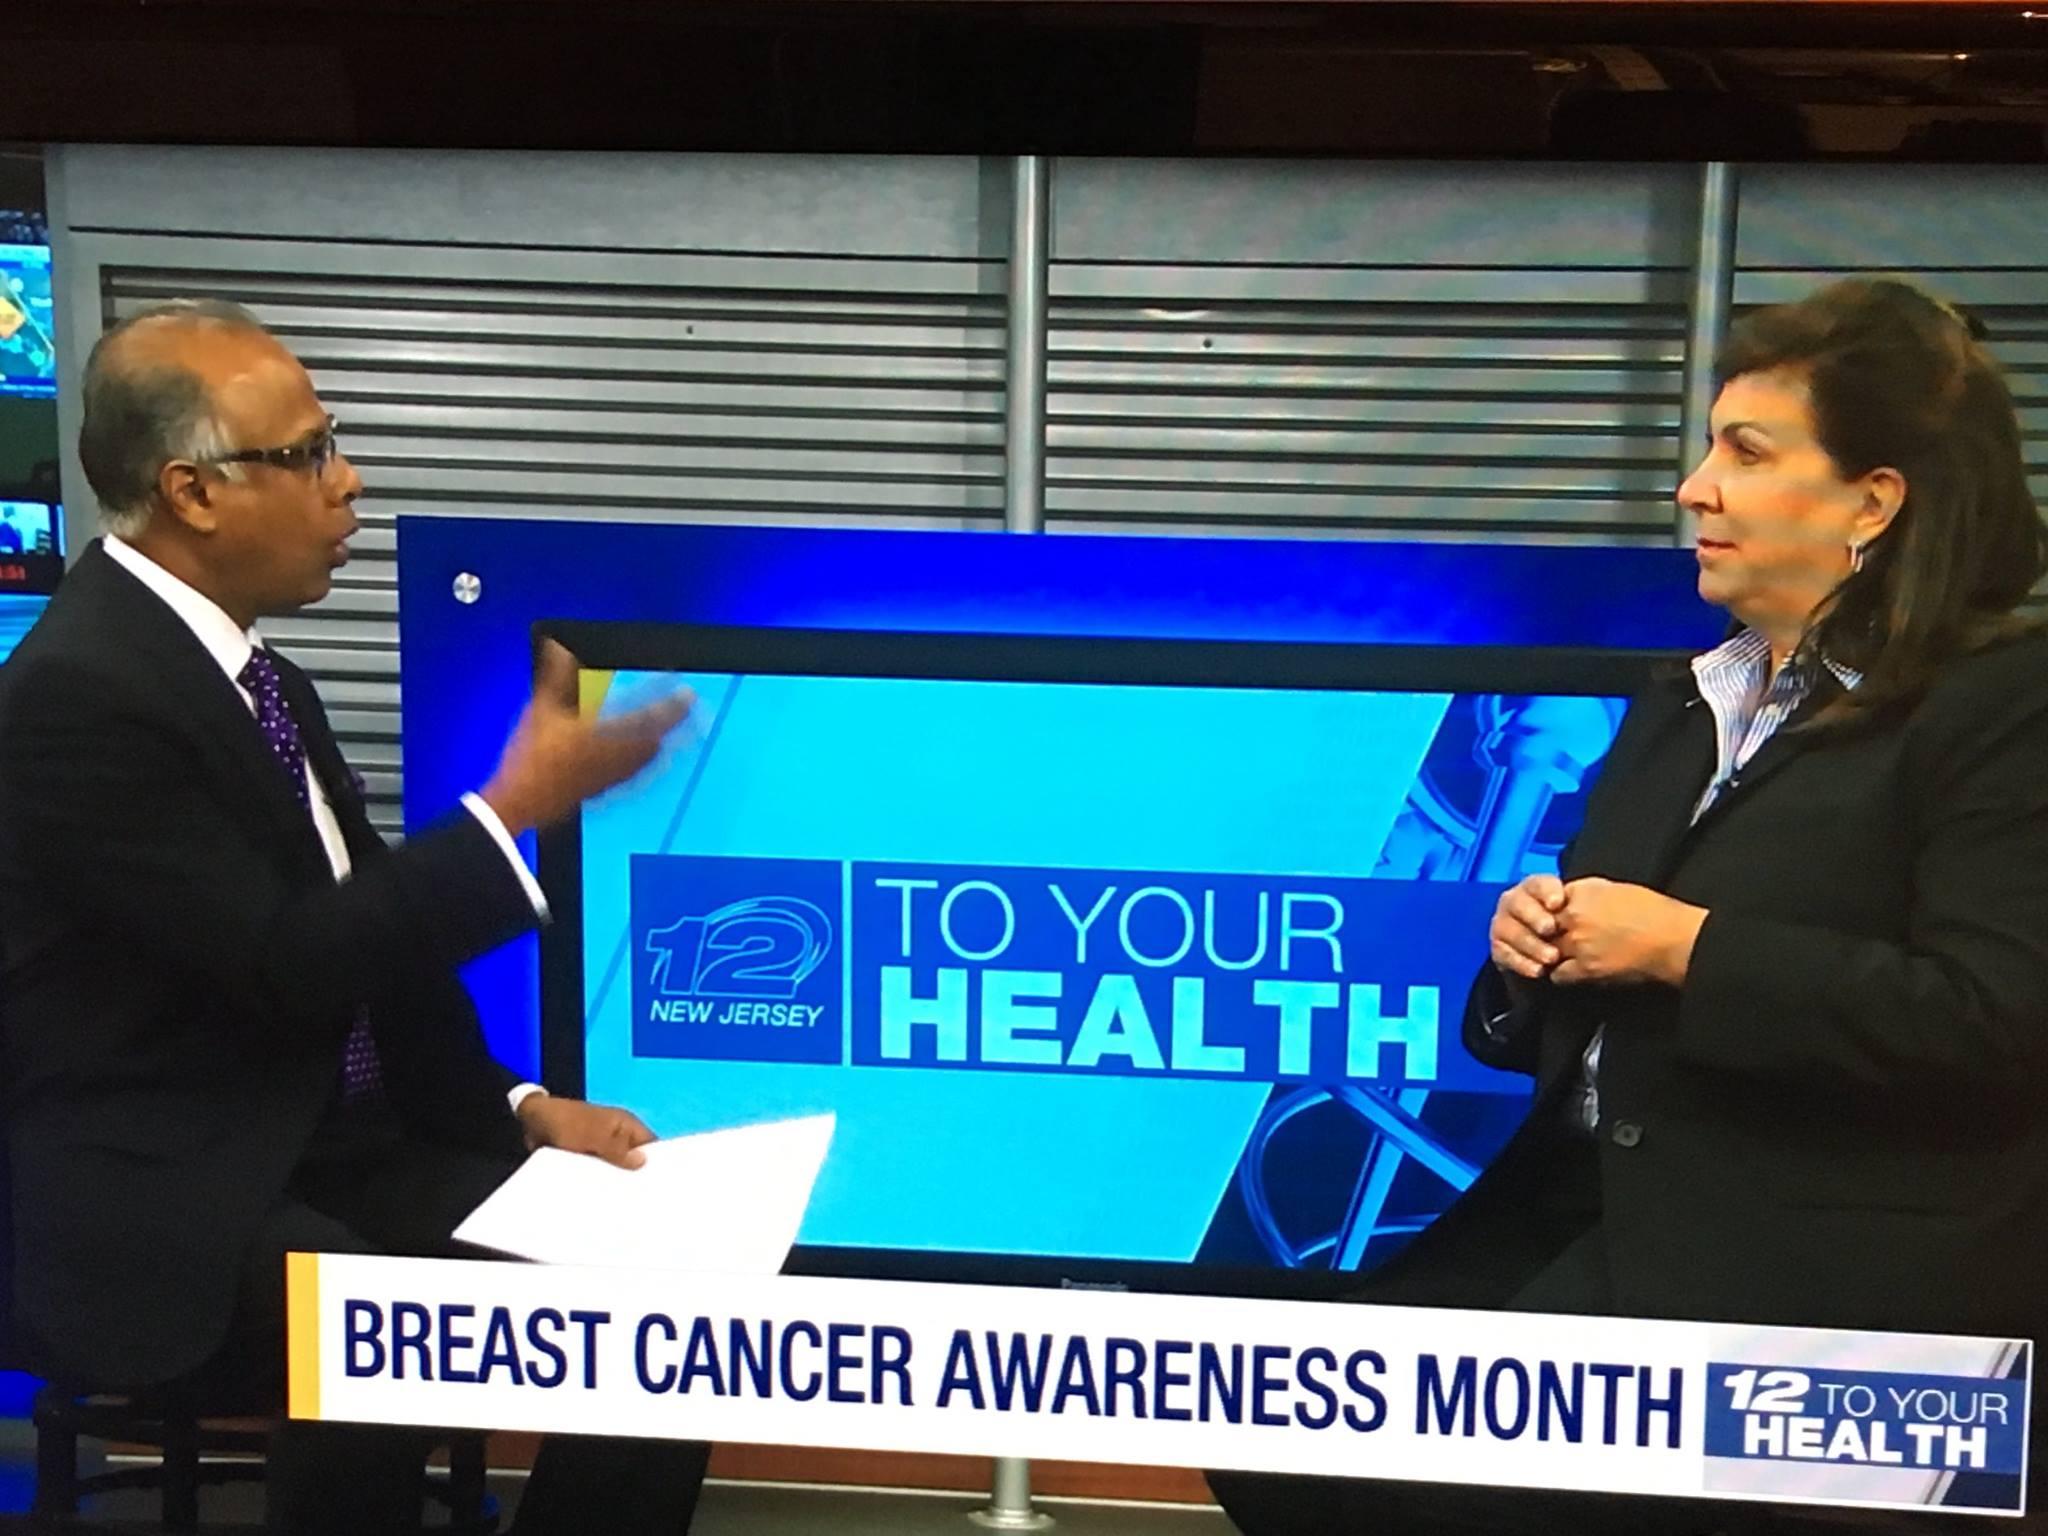 RWJ Breast Cancer Awareness